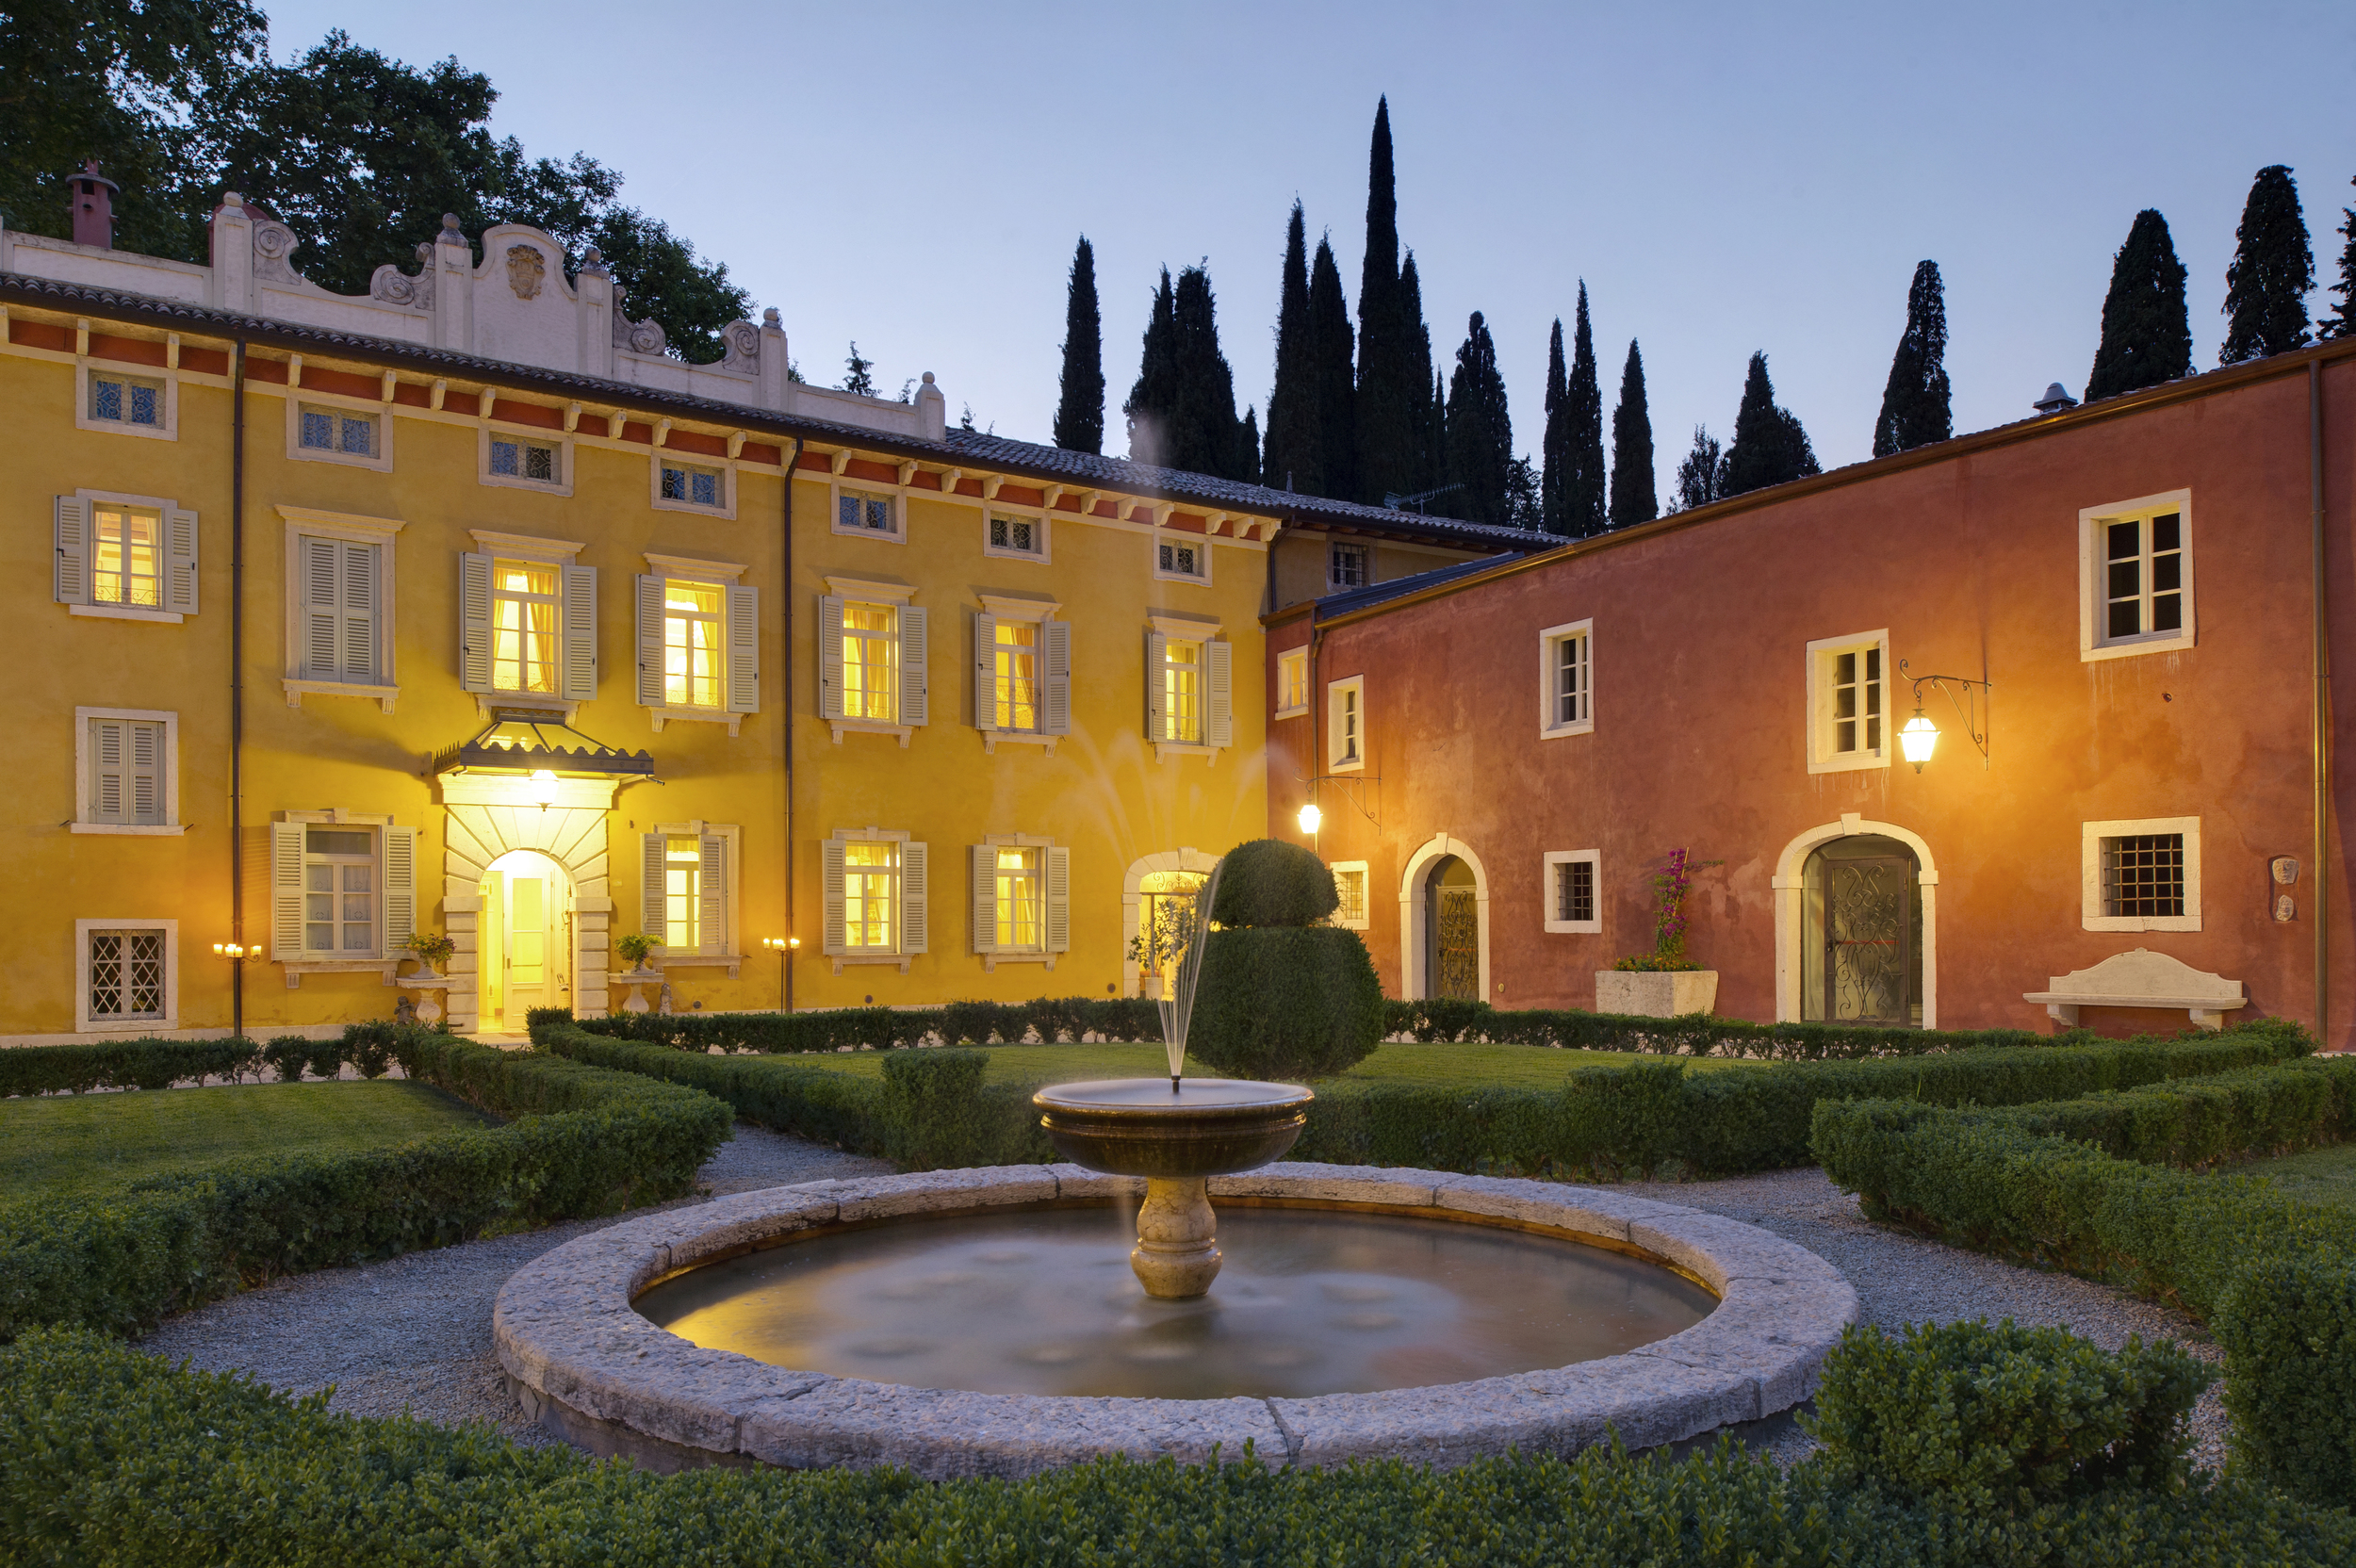 Villa Cordevigo Wine & Relais - Cavaion, Veronese, Italy - Sensi e Diletti's Yoga Wine Tour